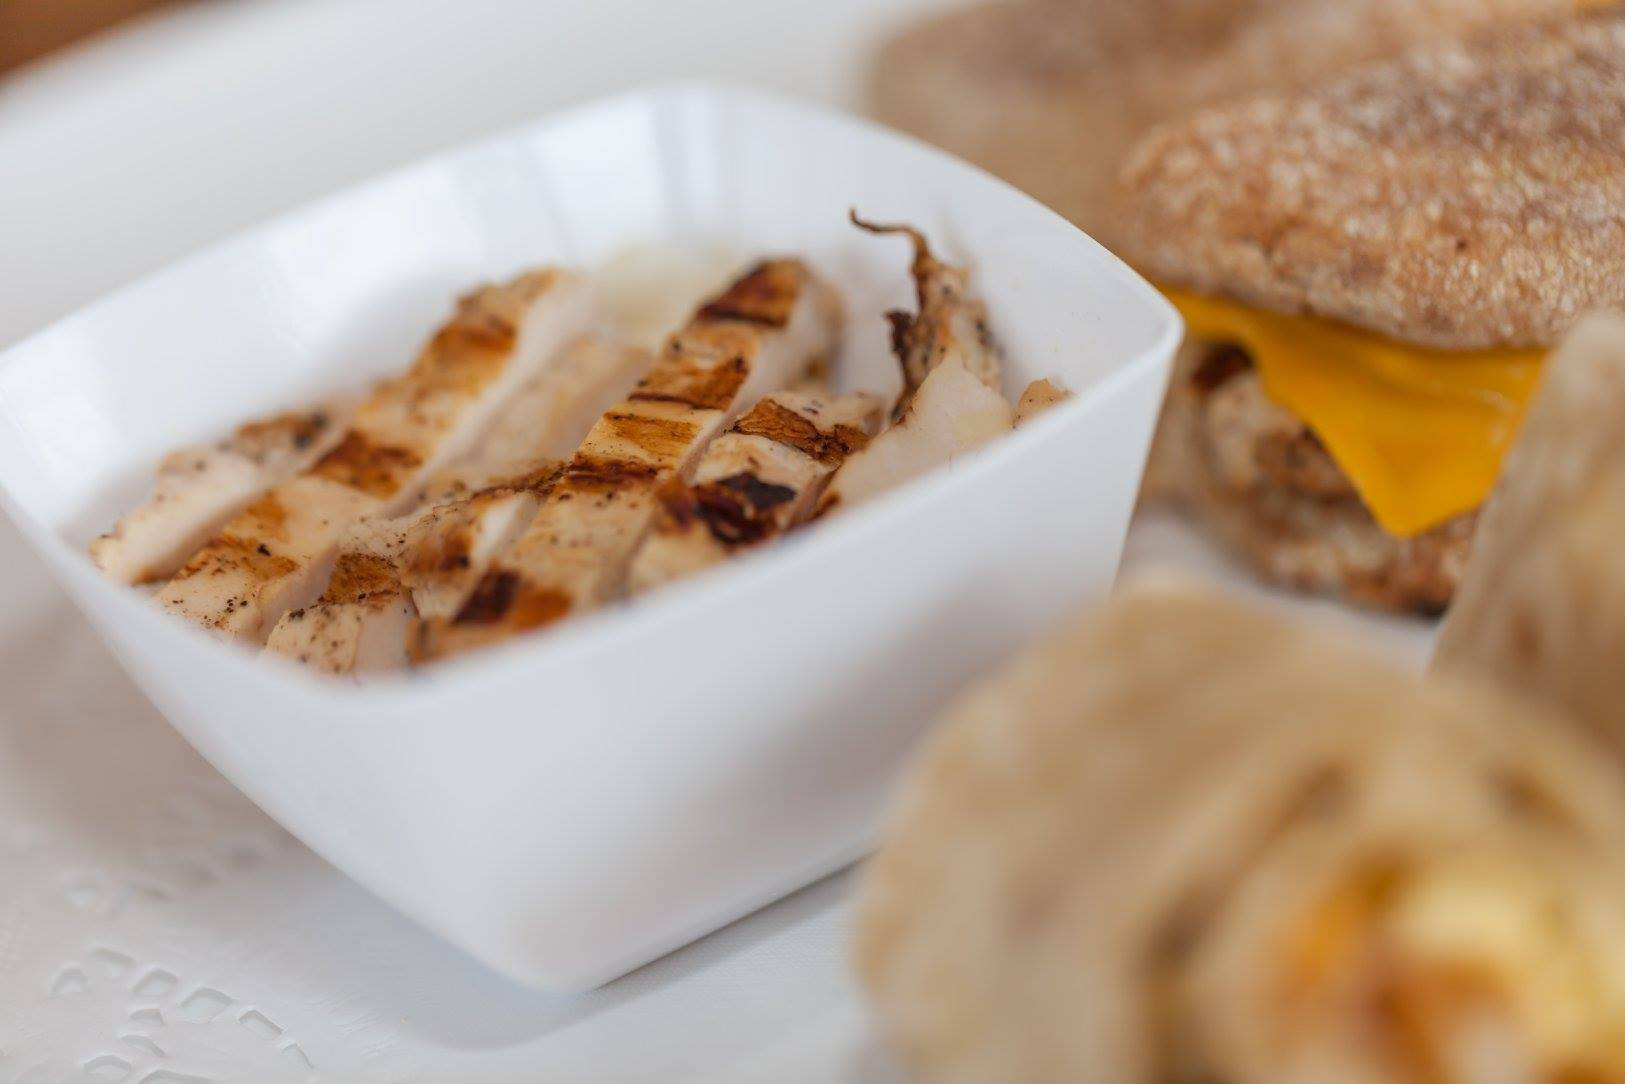 Healthy Chick Fil A Breakfast  Chick fil A Healthier Breakfast Options Beltway Bargain